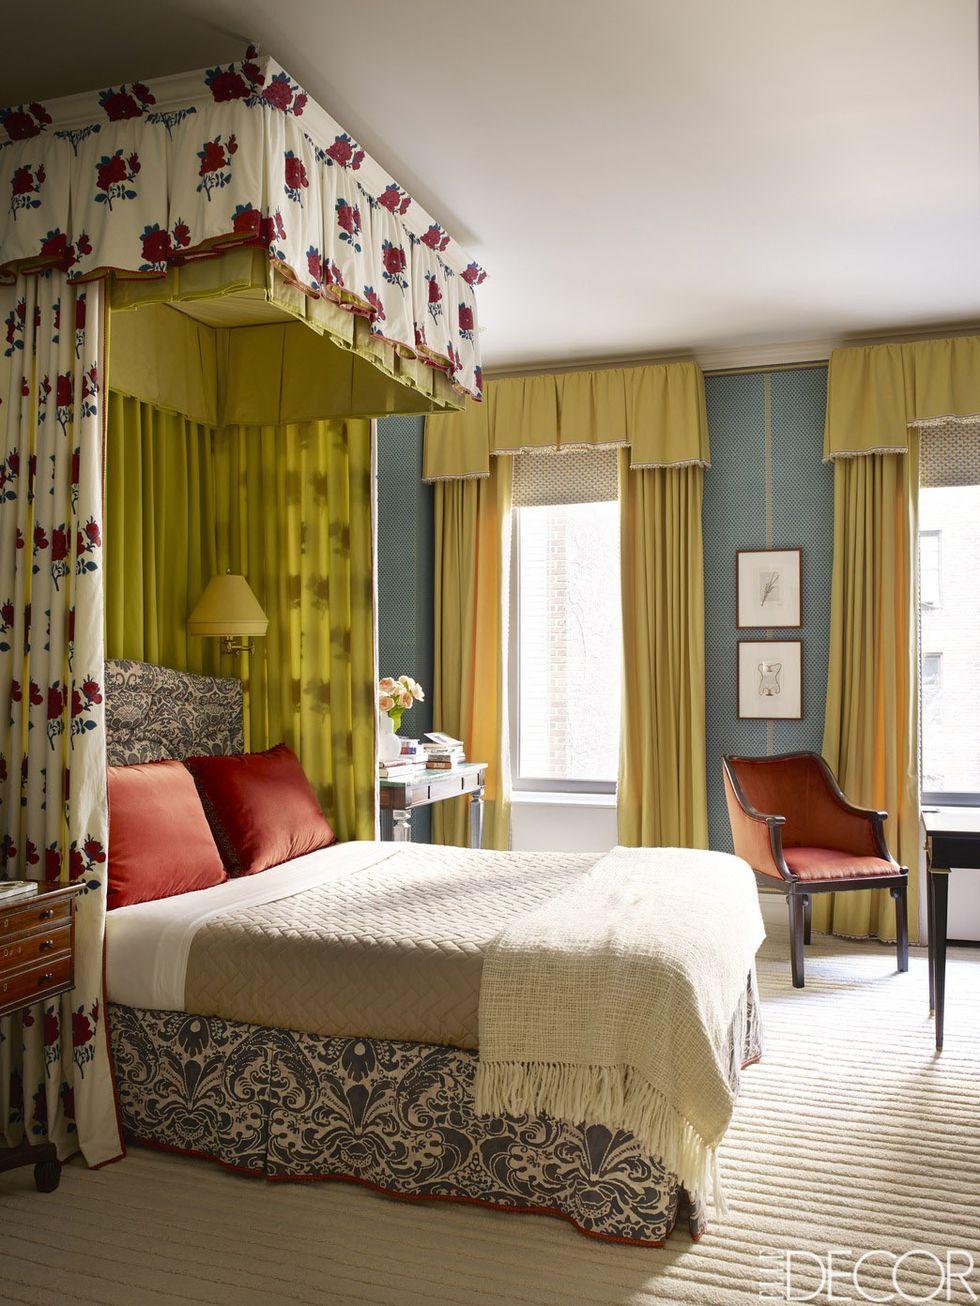 Best Bedroom Curtains - Ideas for Bedroom Window Treatments on Master Bedroom Curtains  id=41572